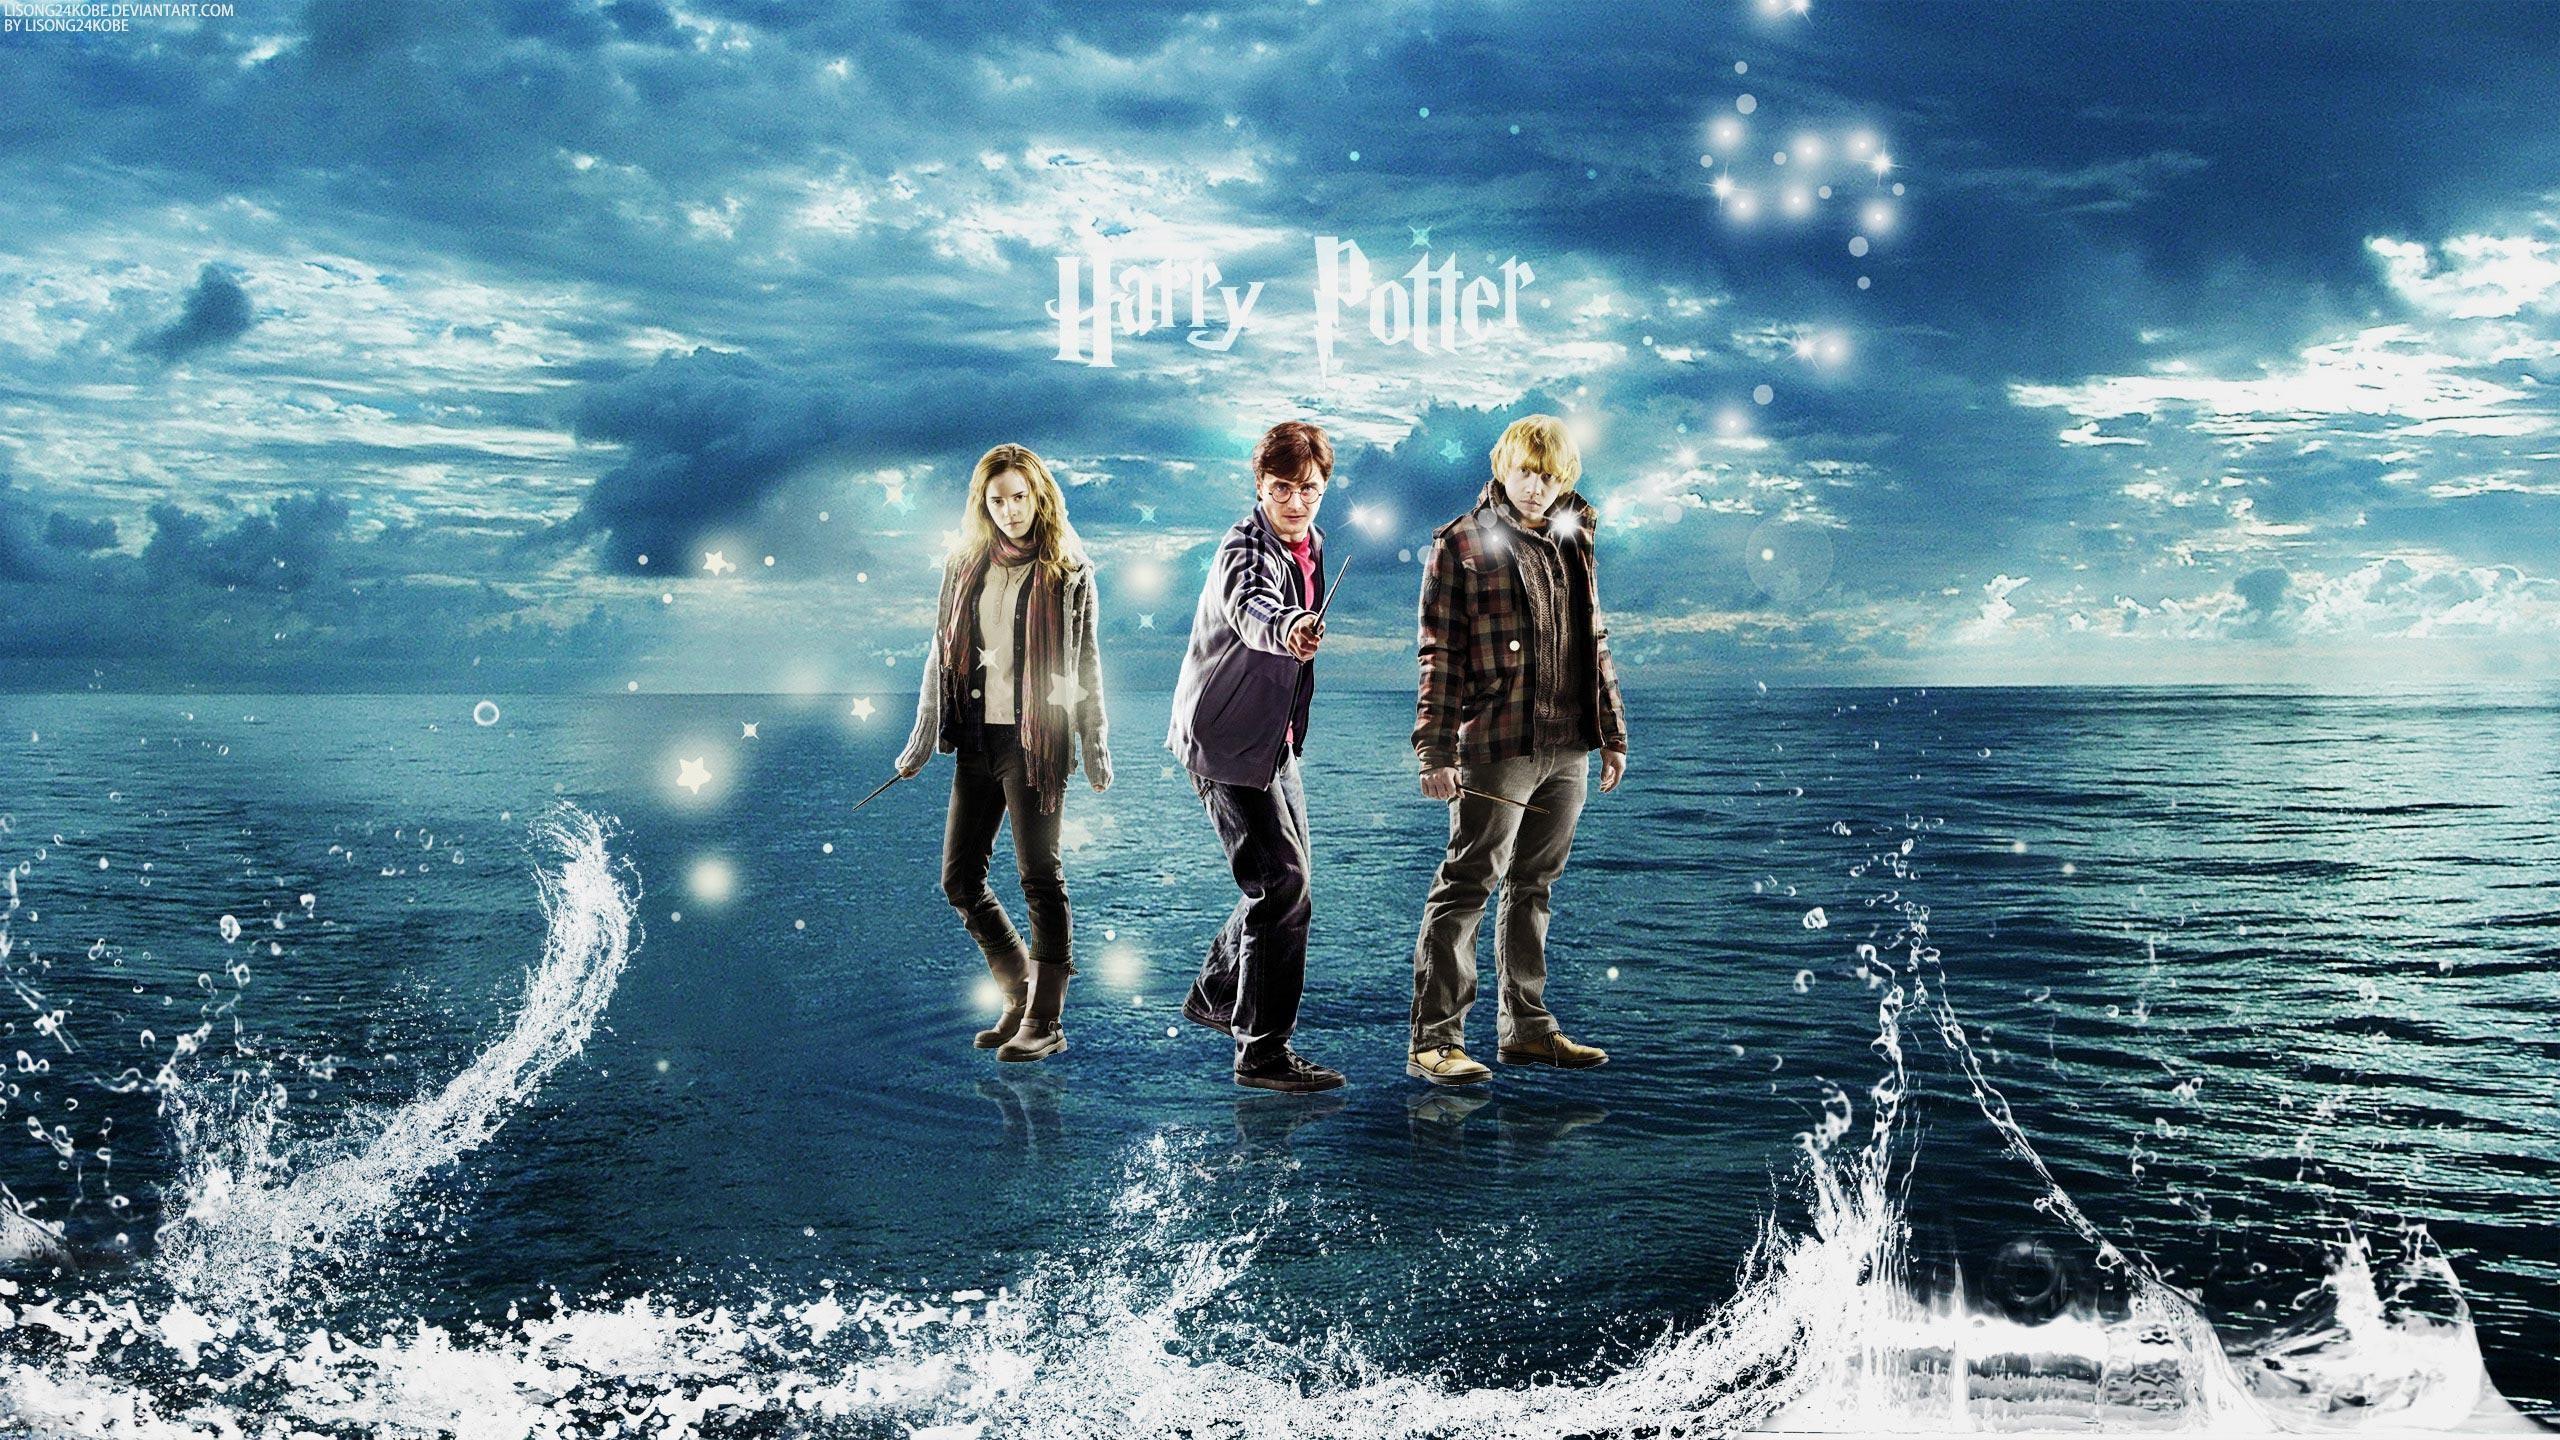 Harry Potter wallpapers for desktop